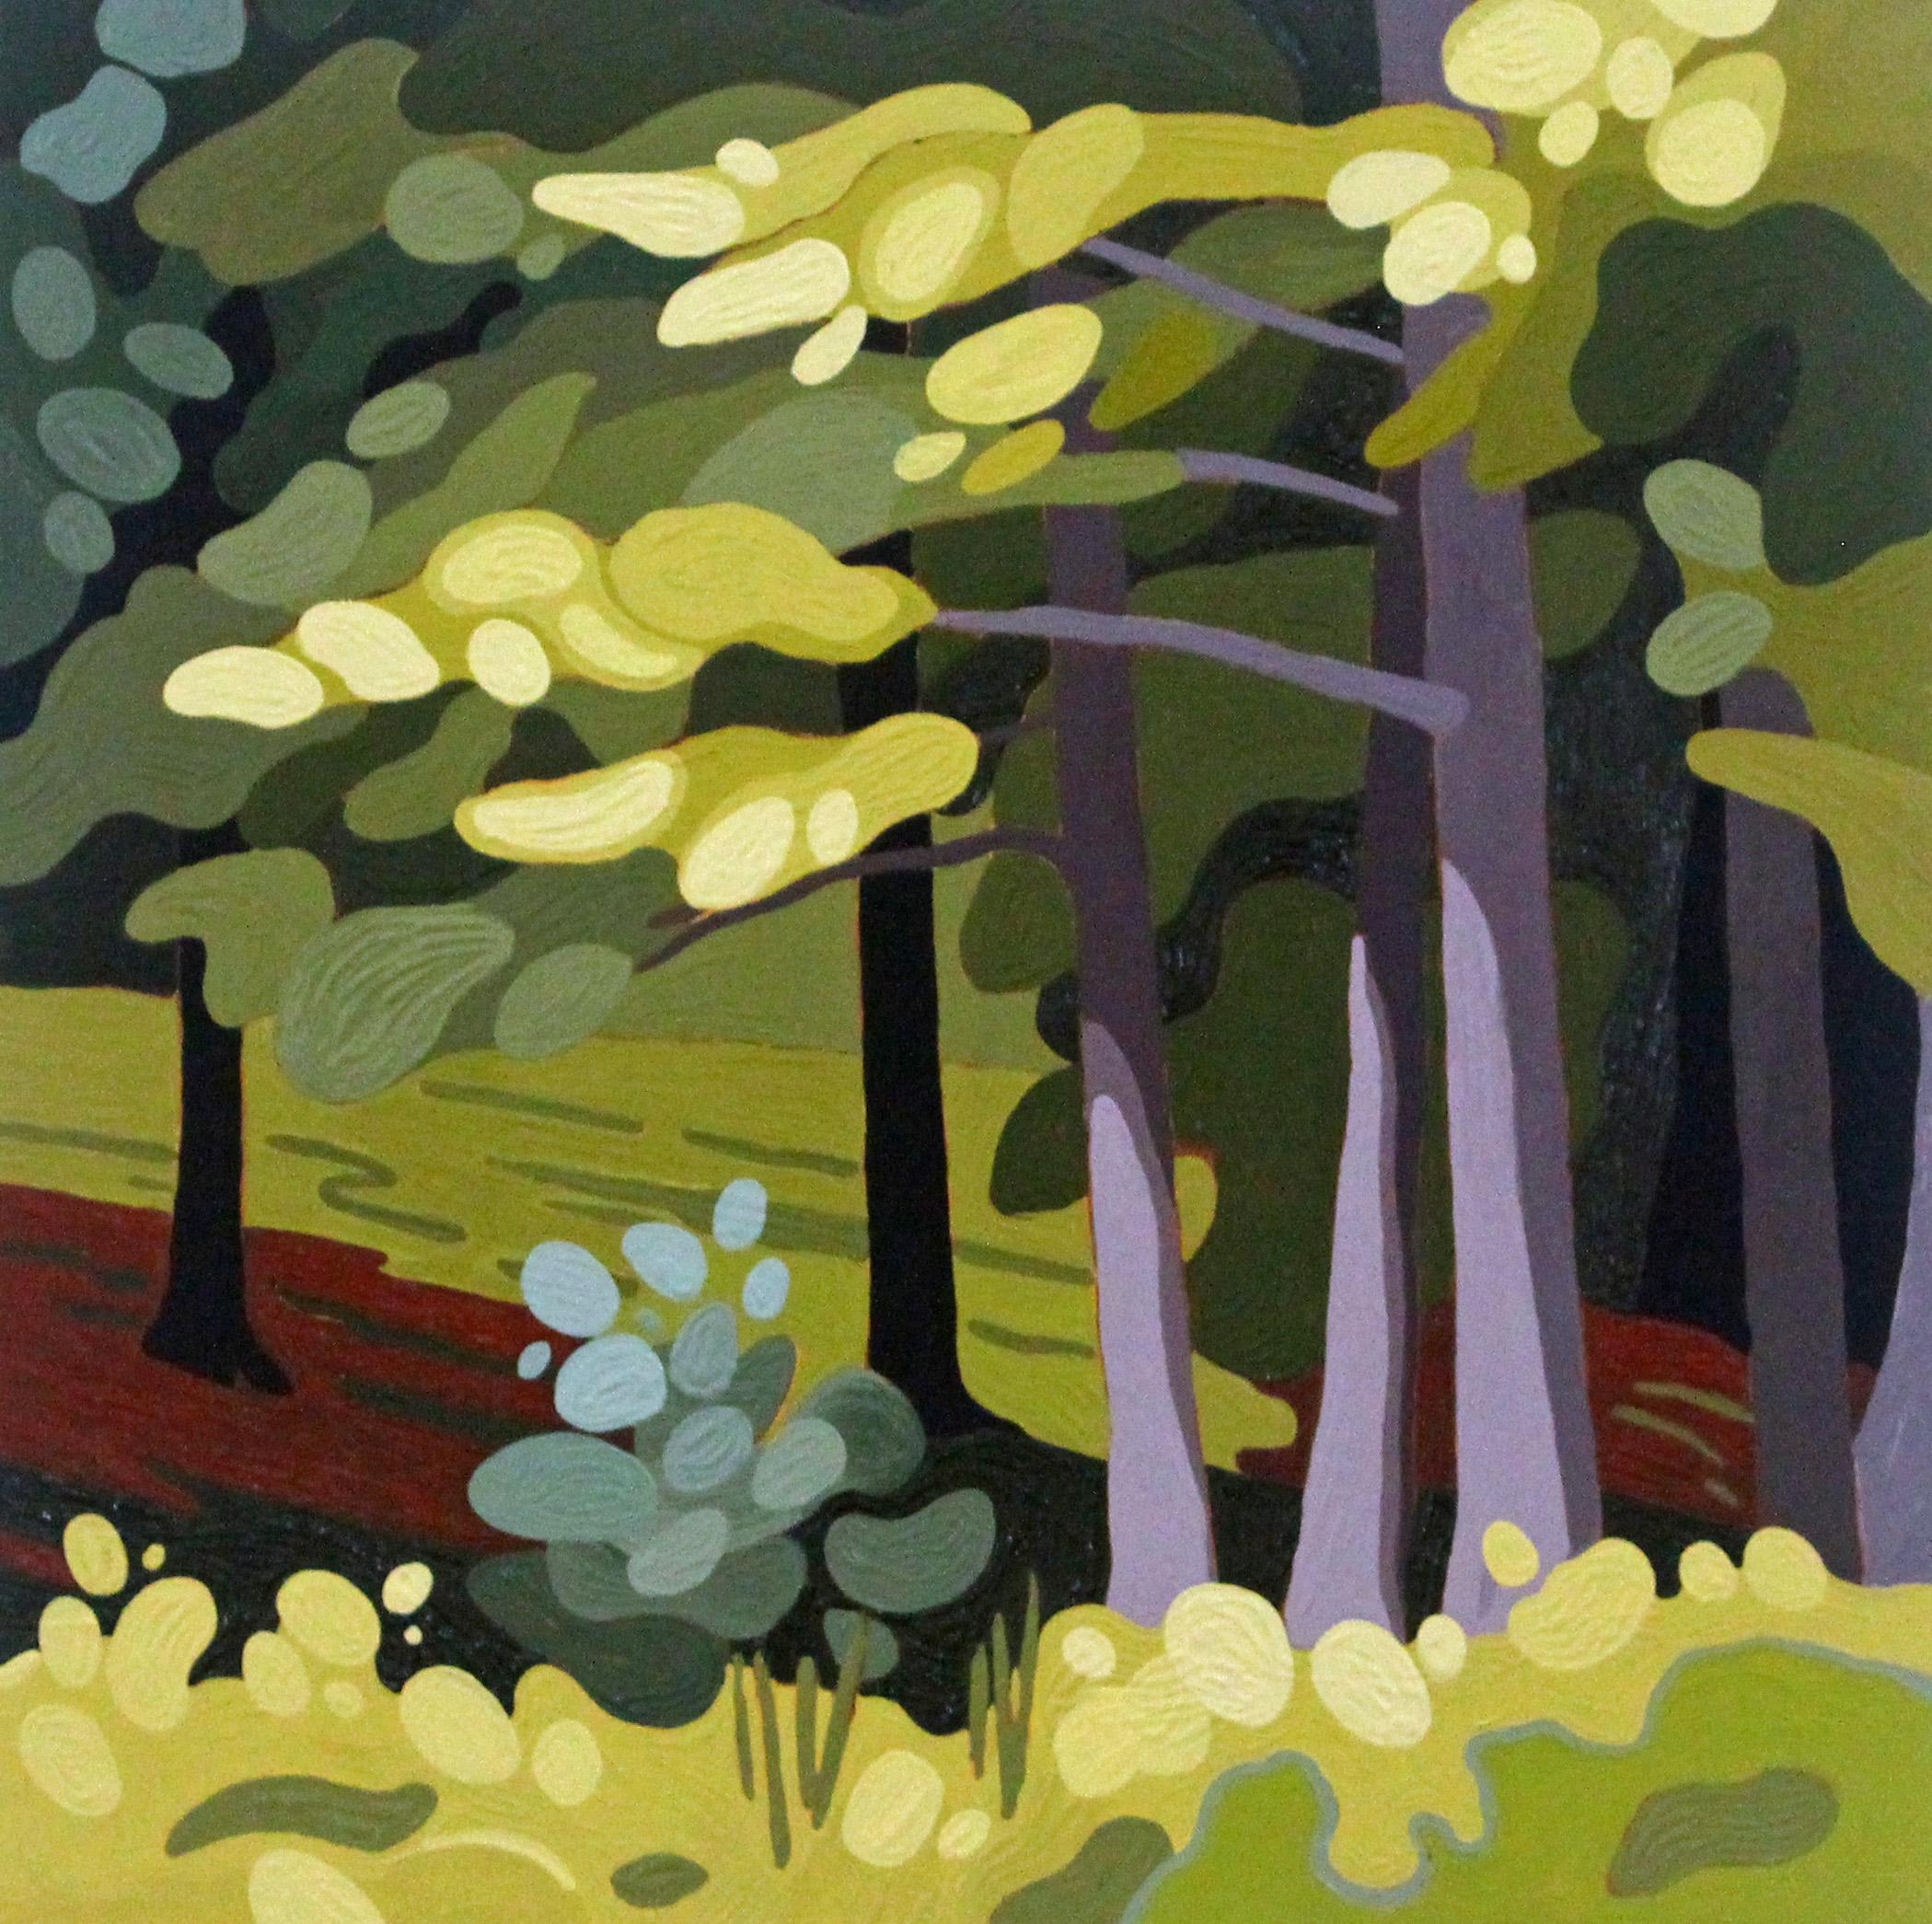 White Pine Boughs, 2020, 12 x 12, Acrylic on Wood Panel